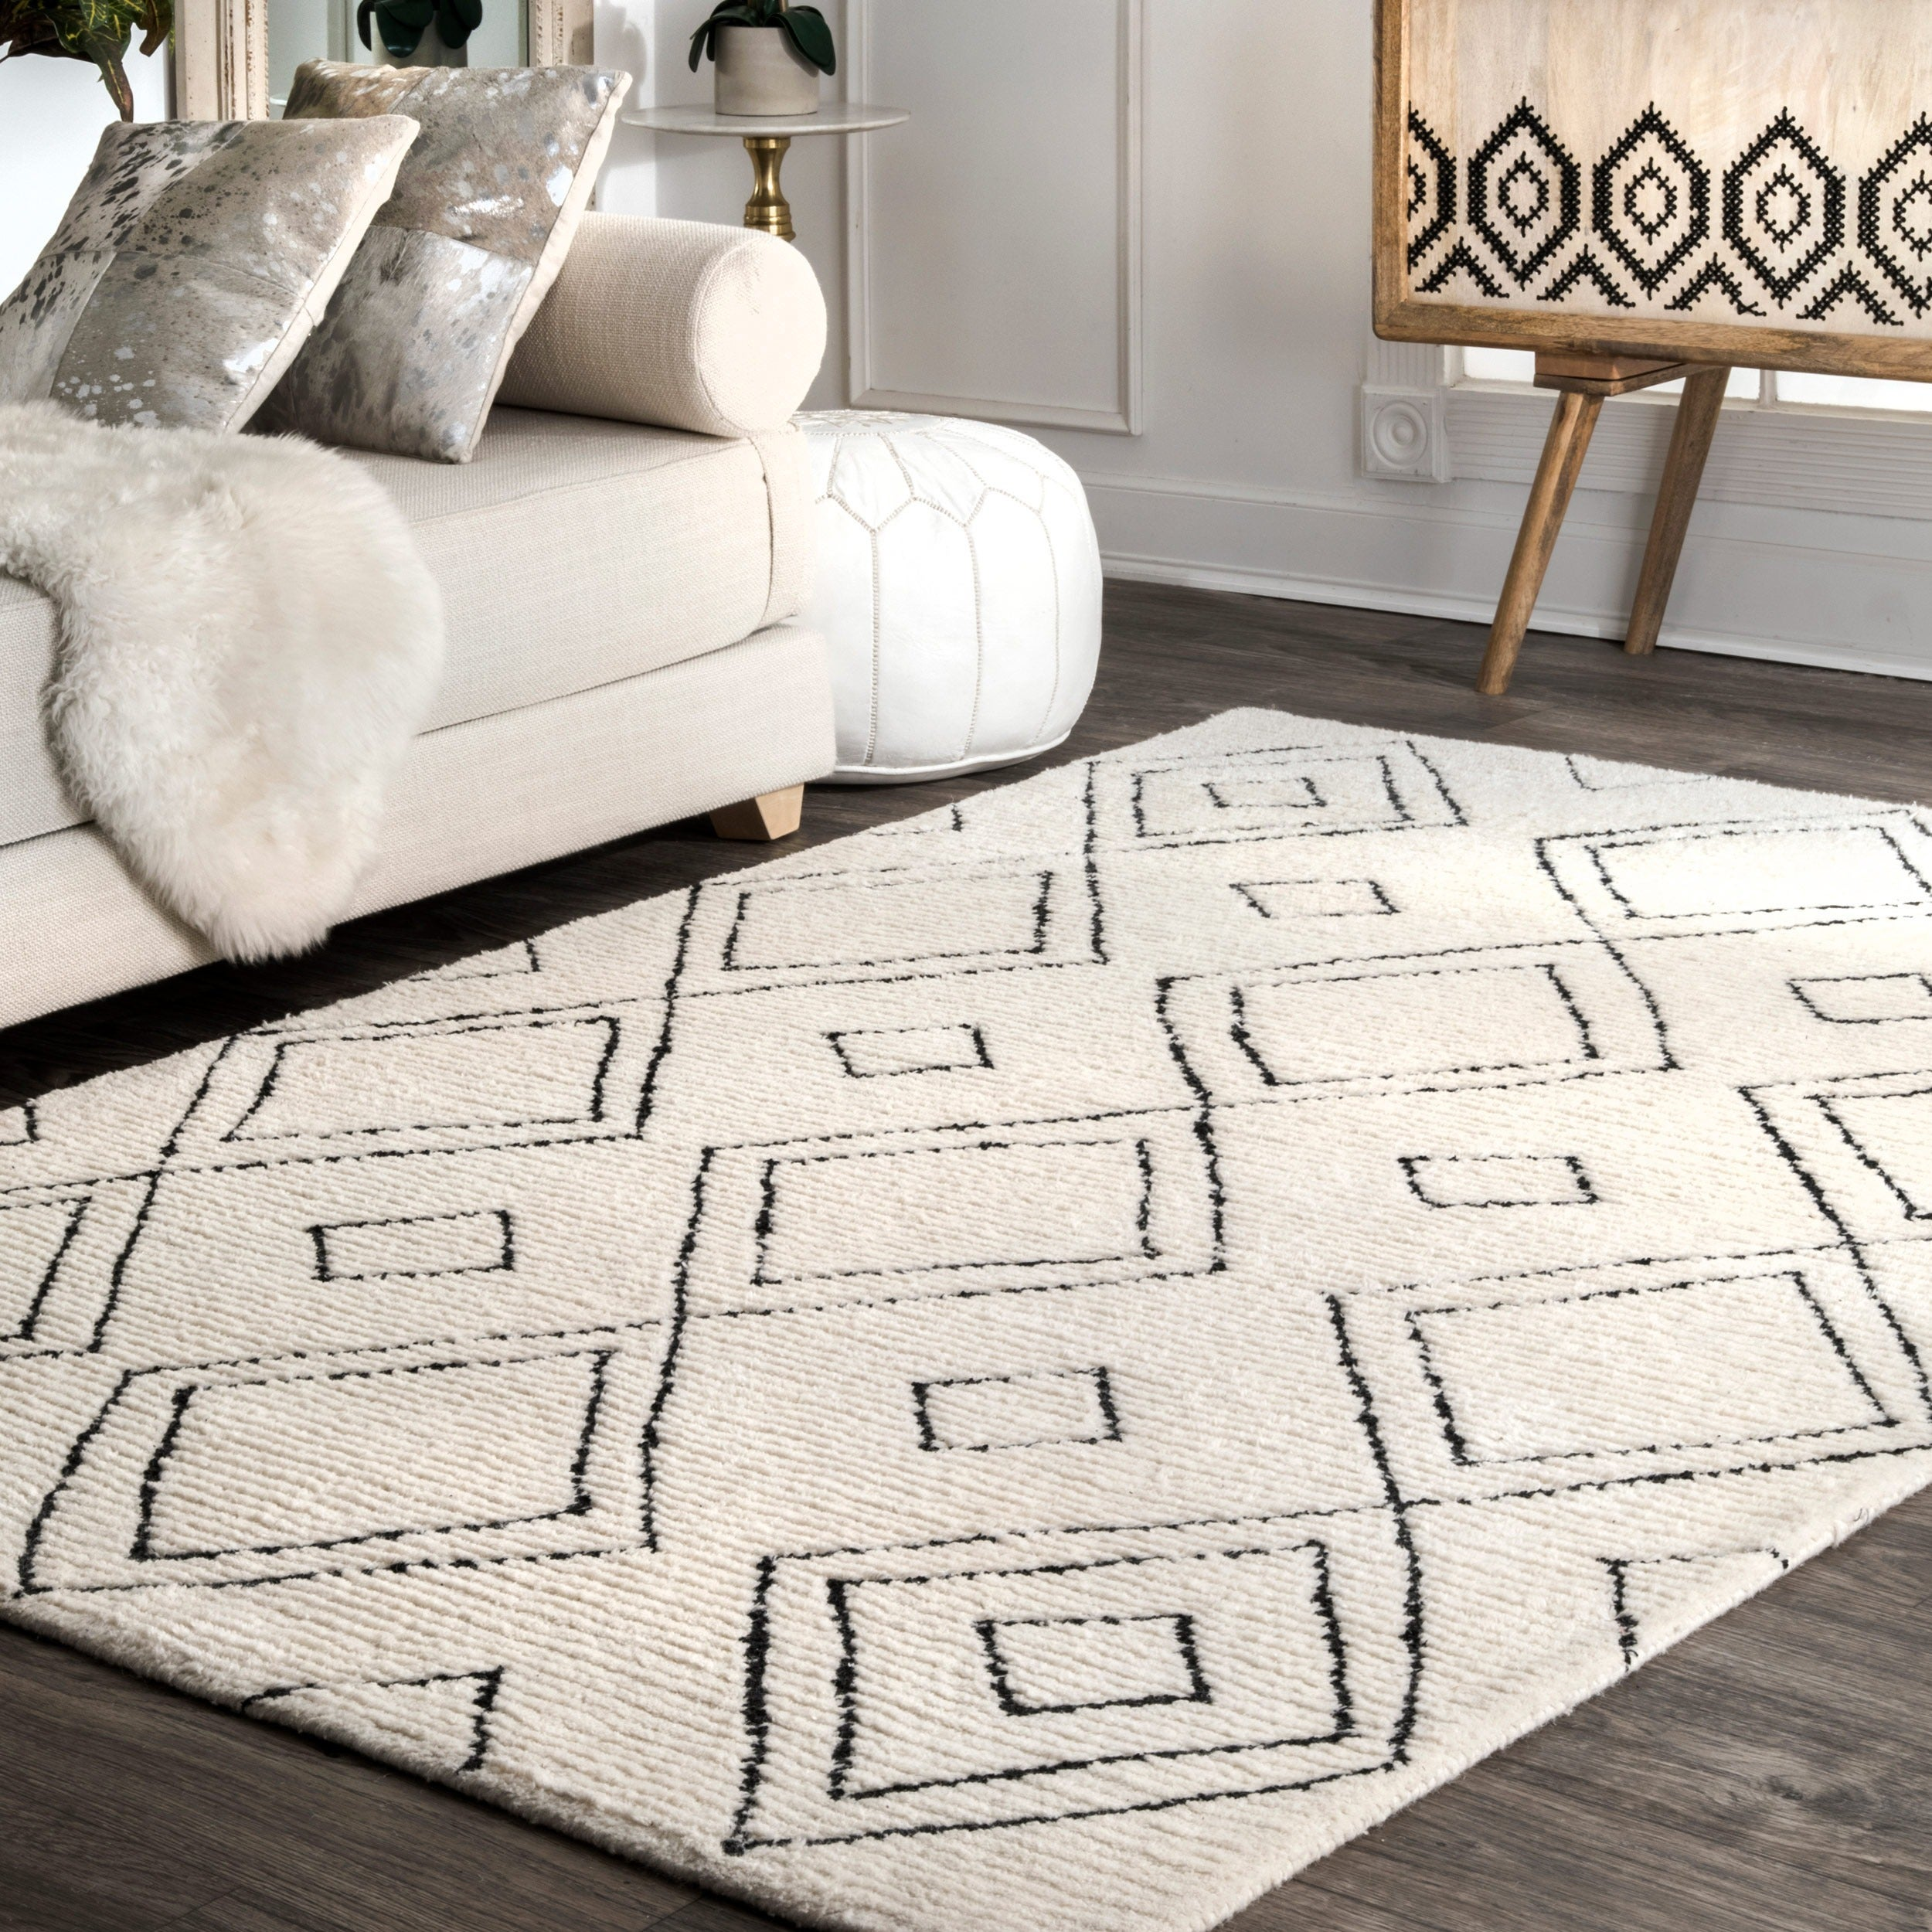 nuLOOM Handmade Moroccan Diamond Trellis Wool Natural Rug (7'6 x 9'6)